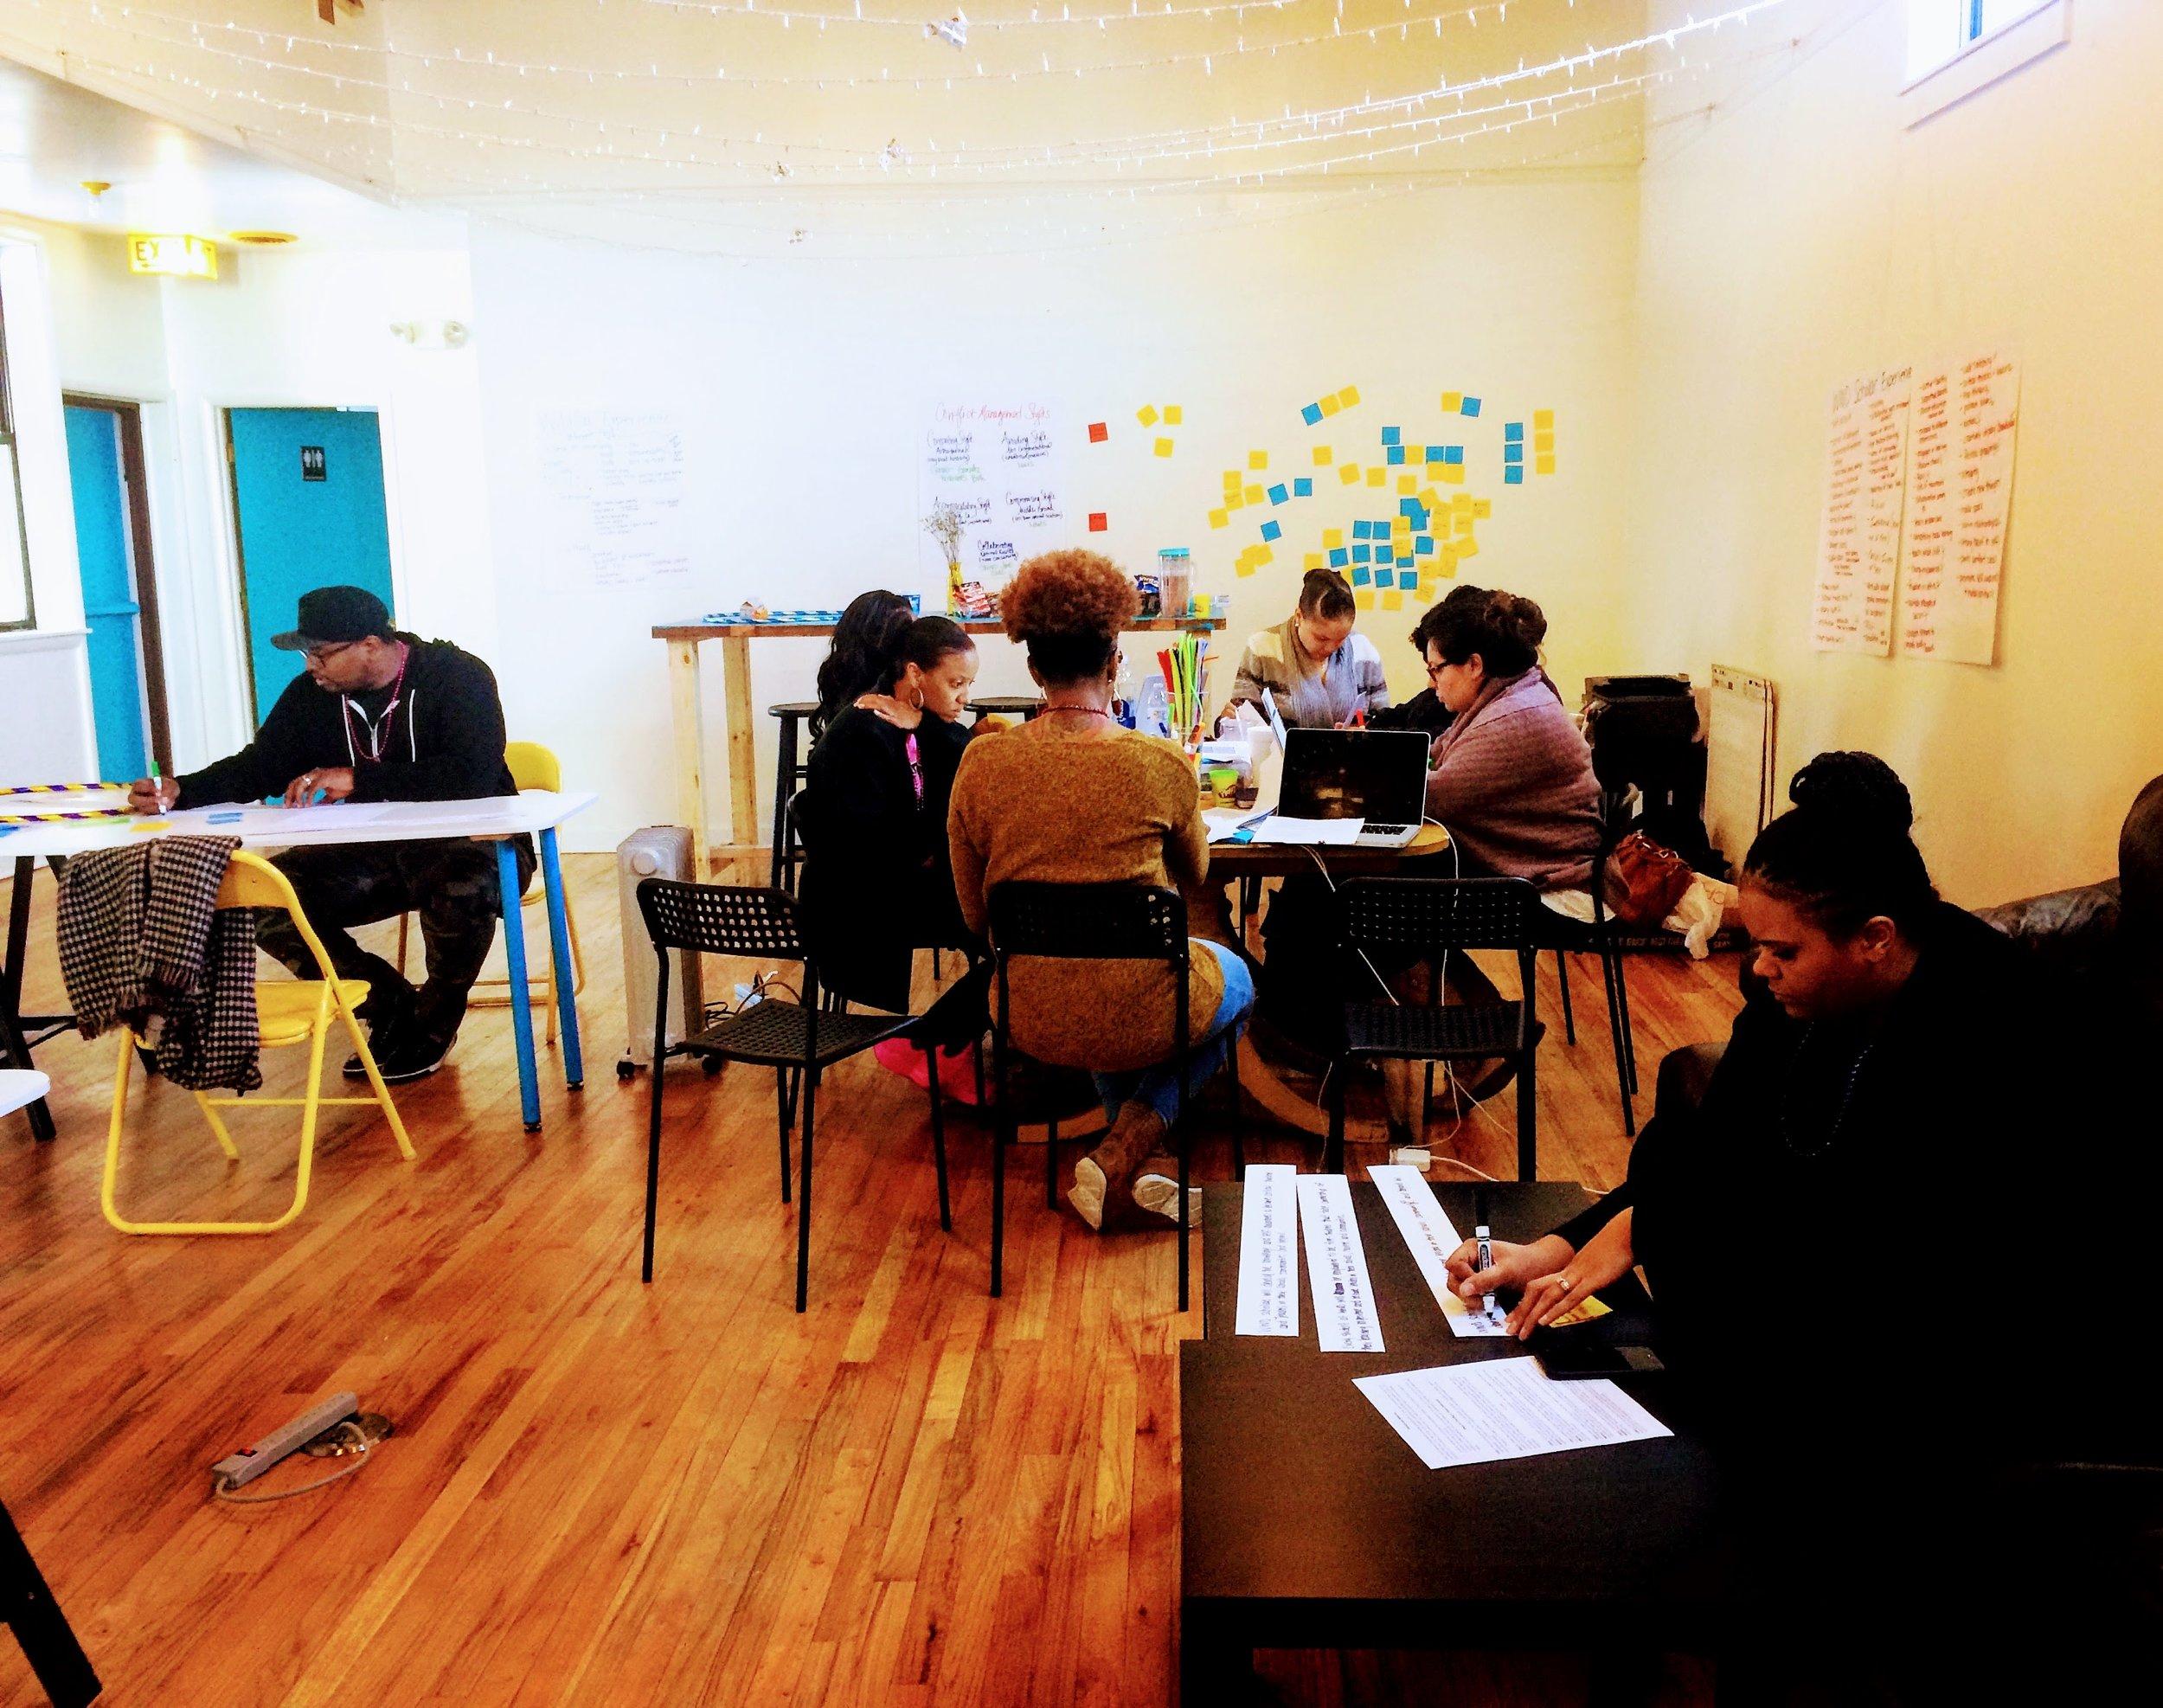 coworking, open work space, meeting space